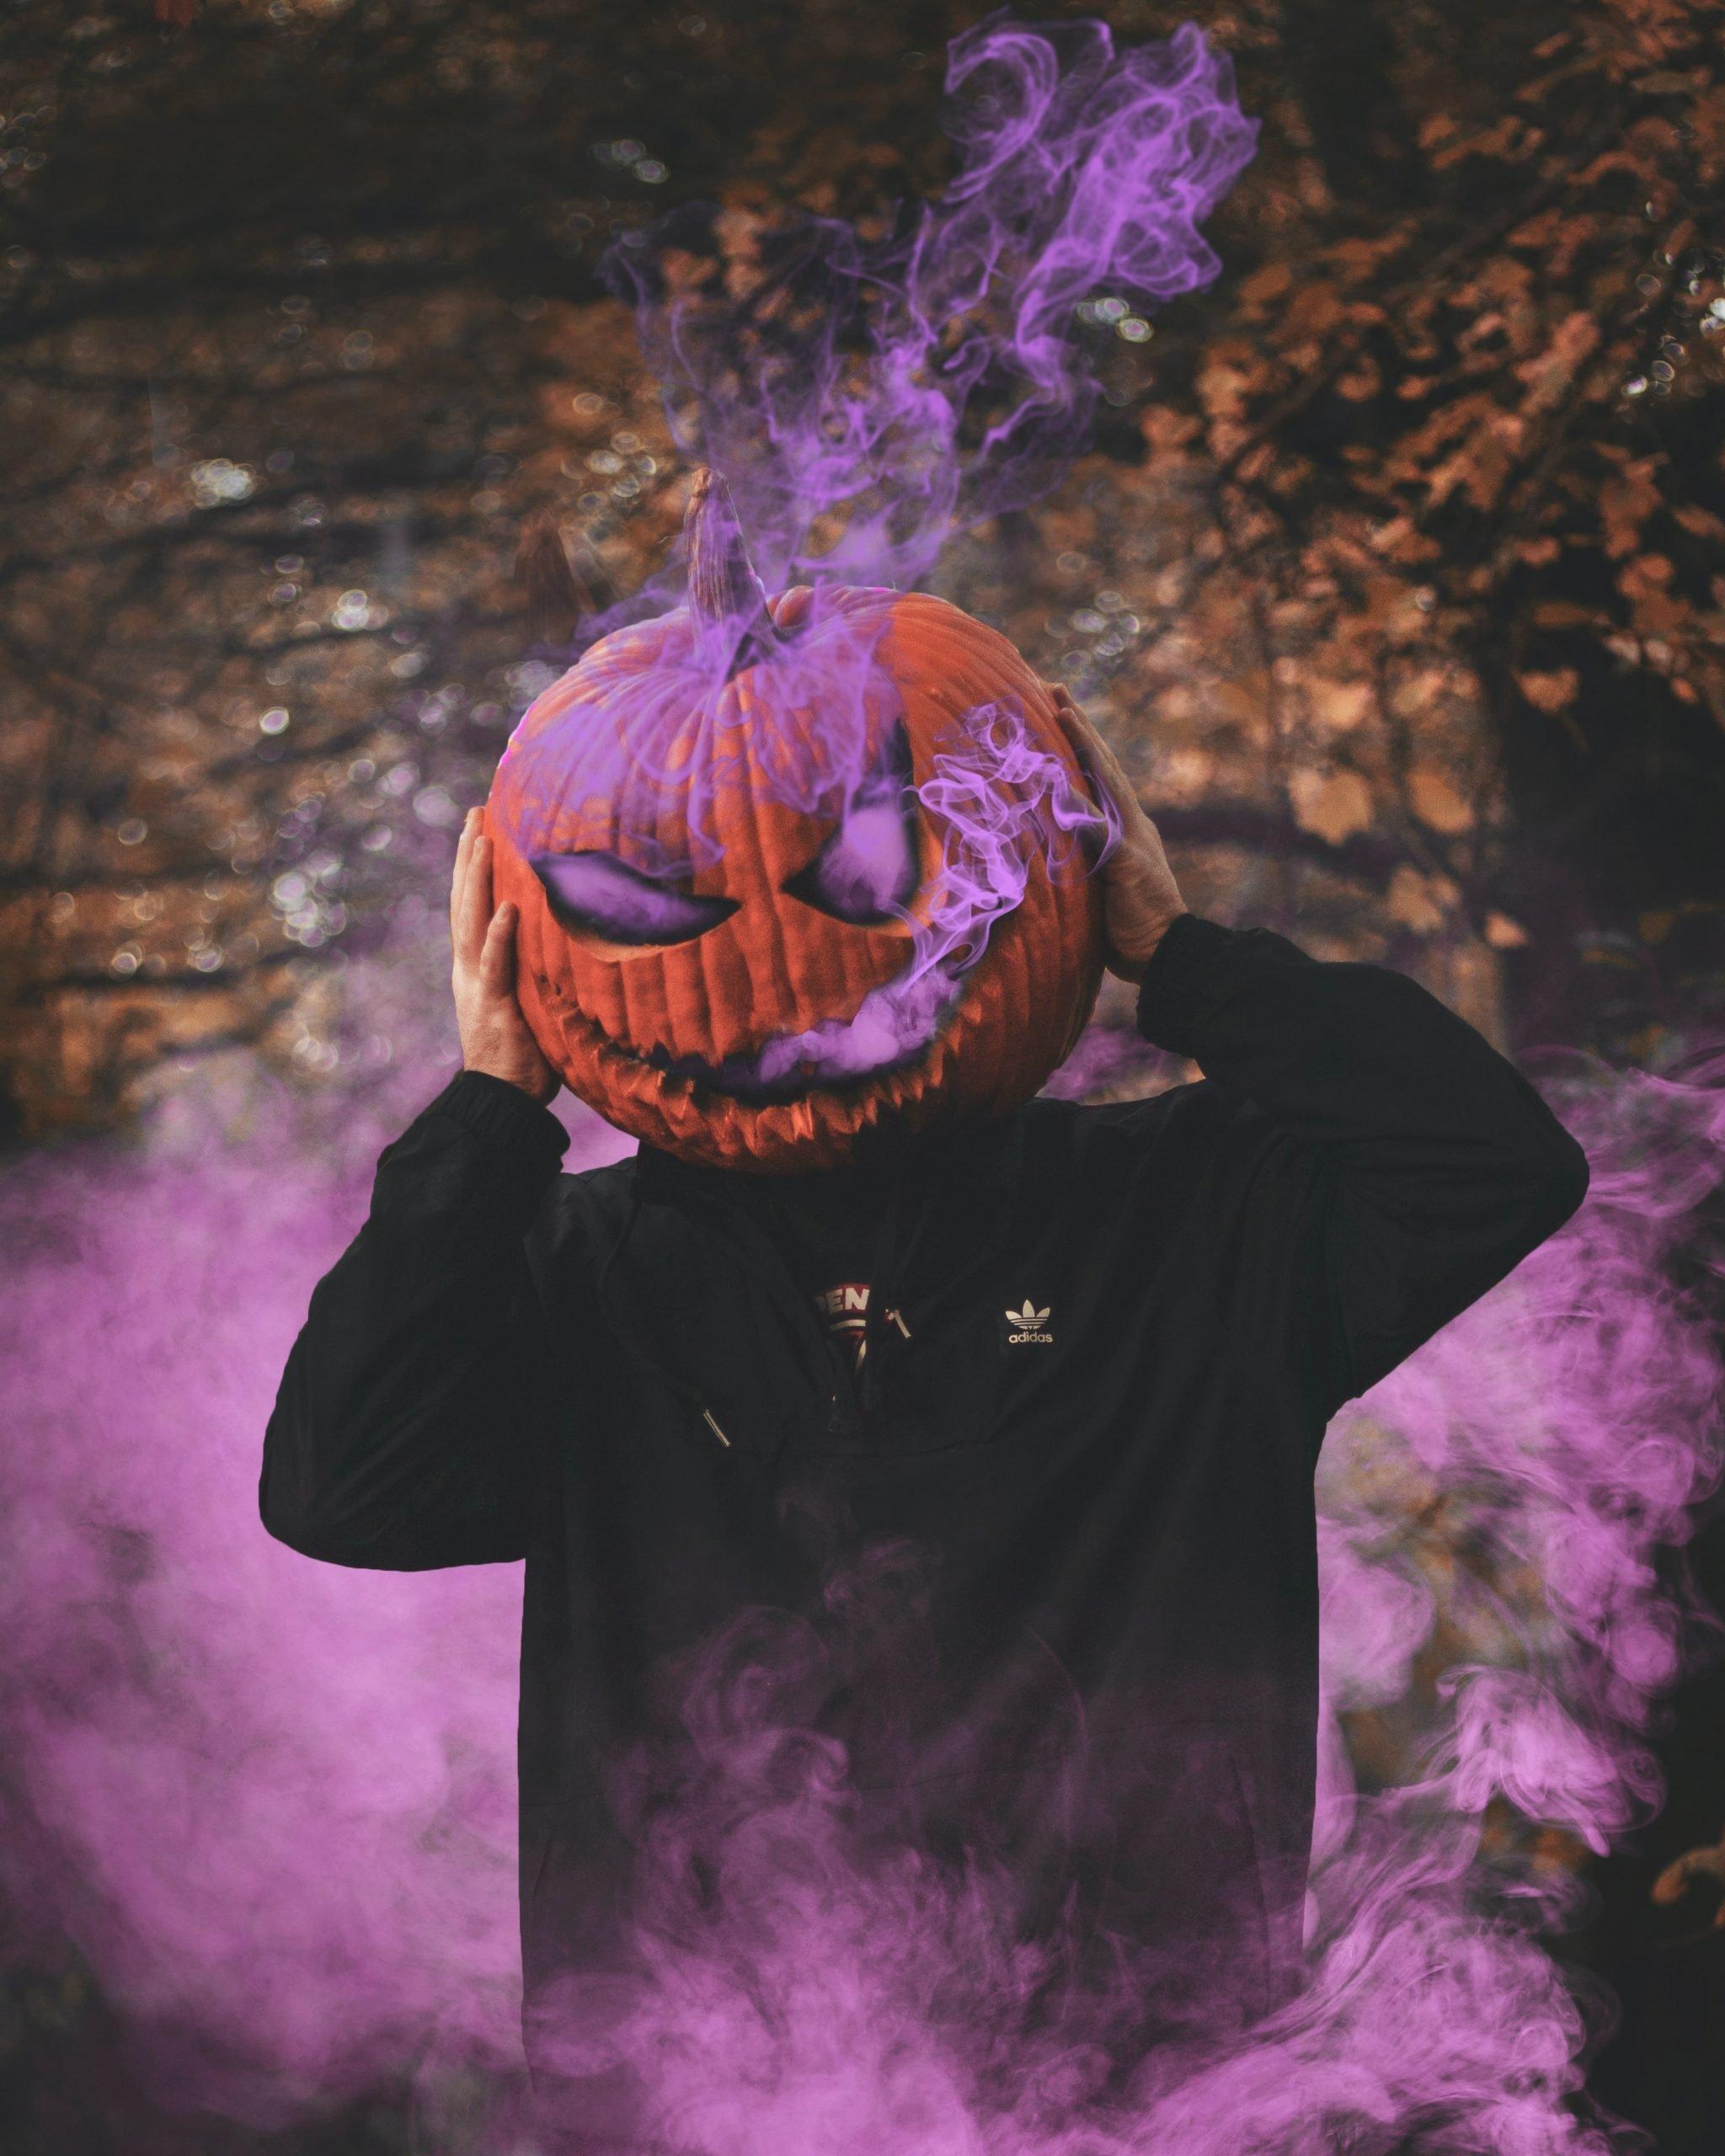 man with pumpkin on head